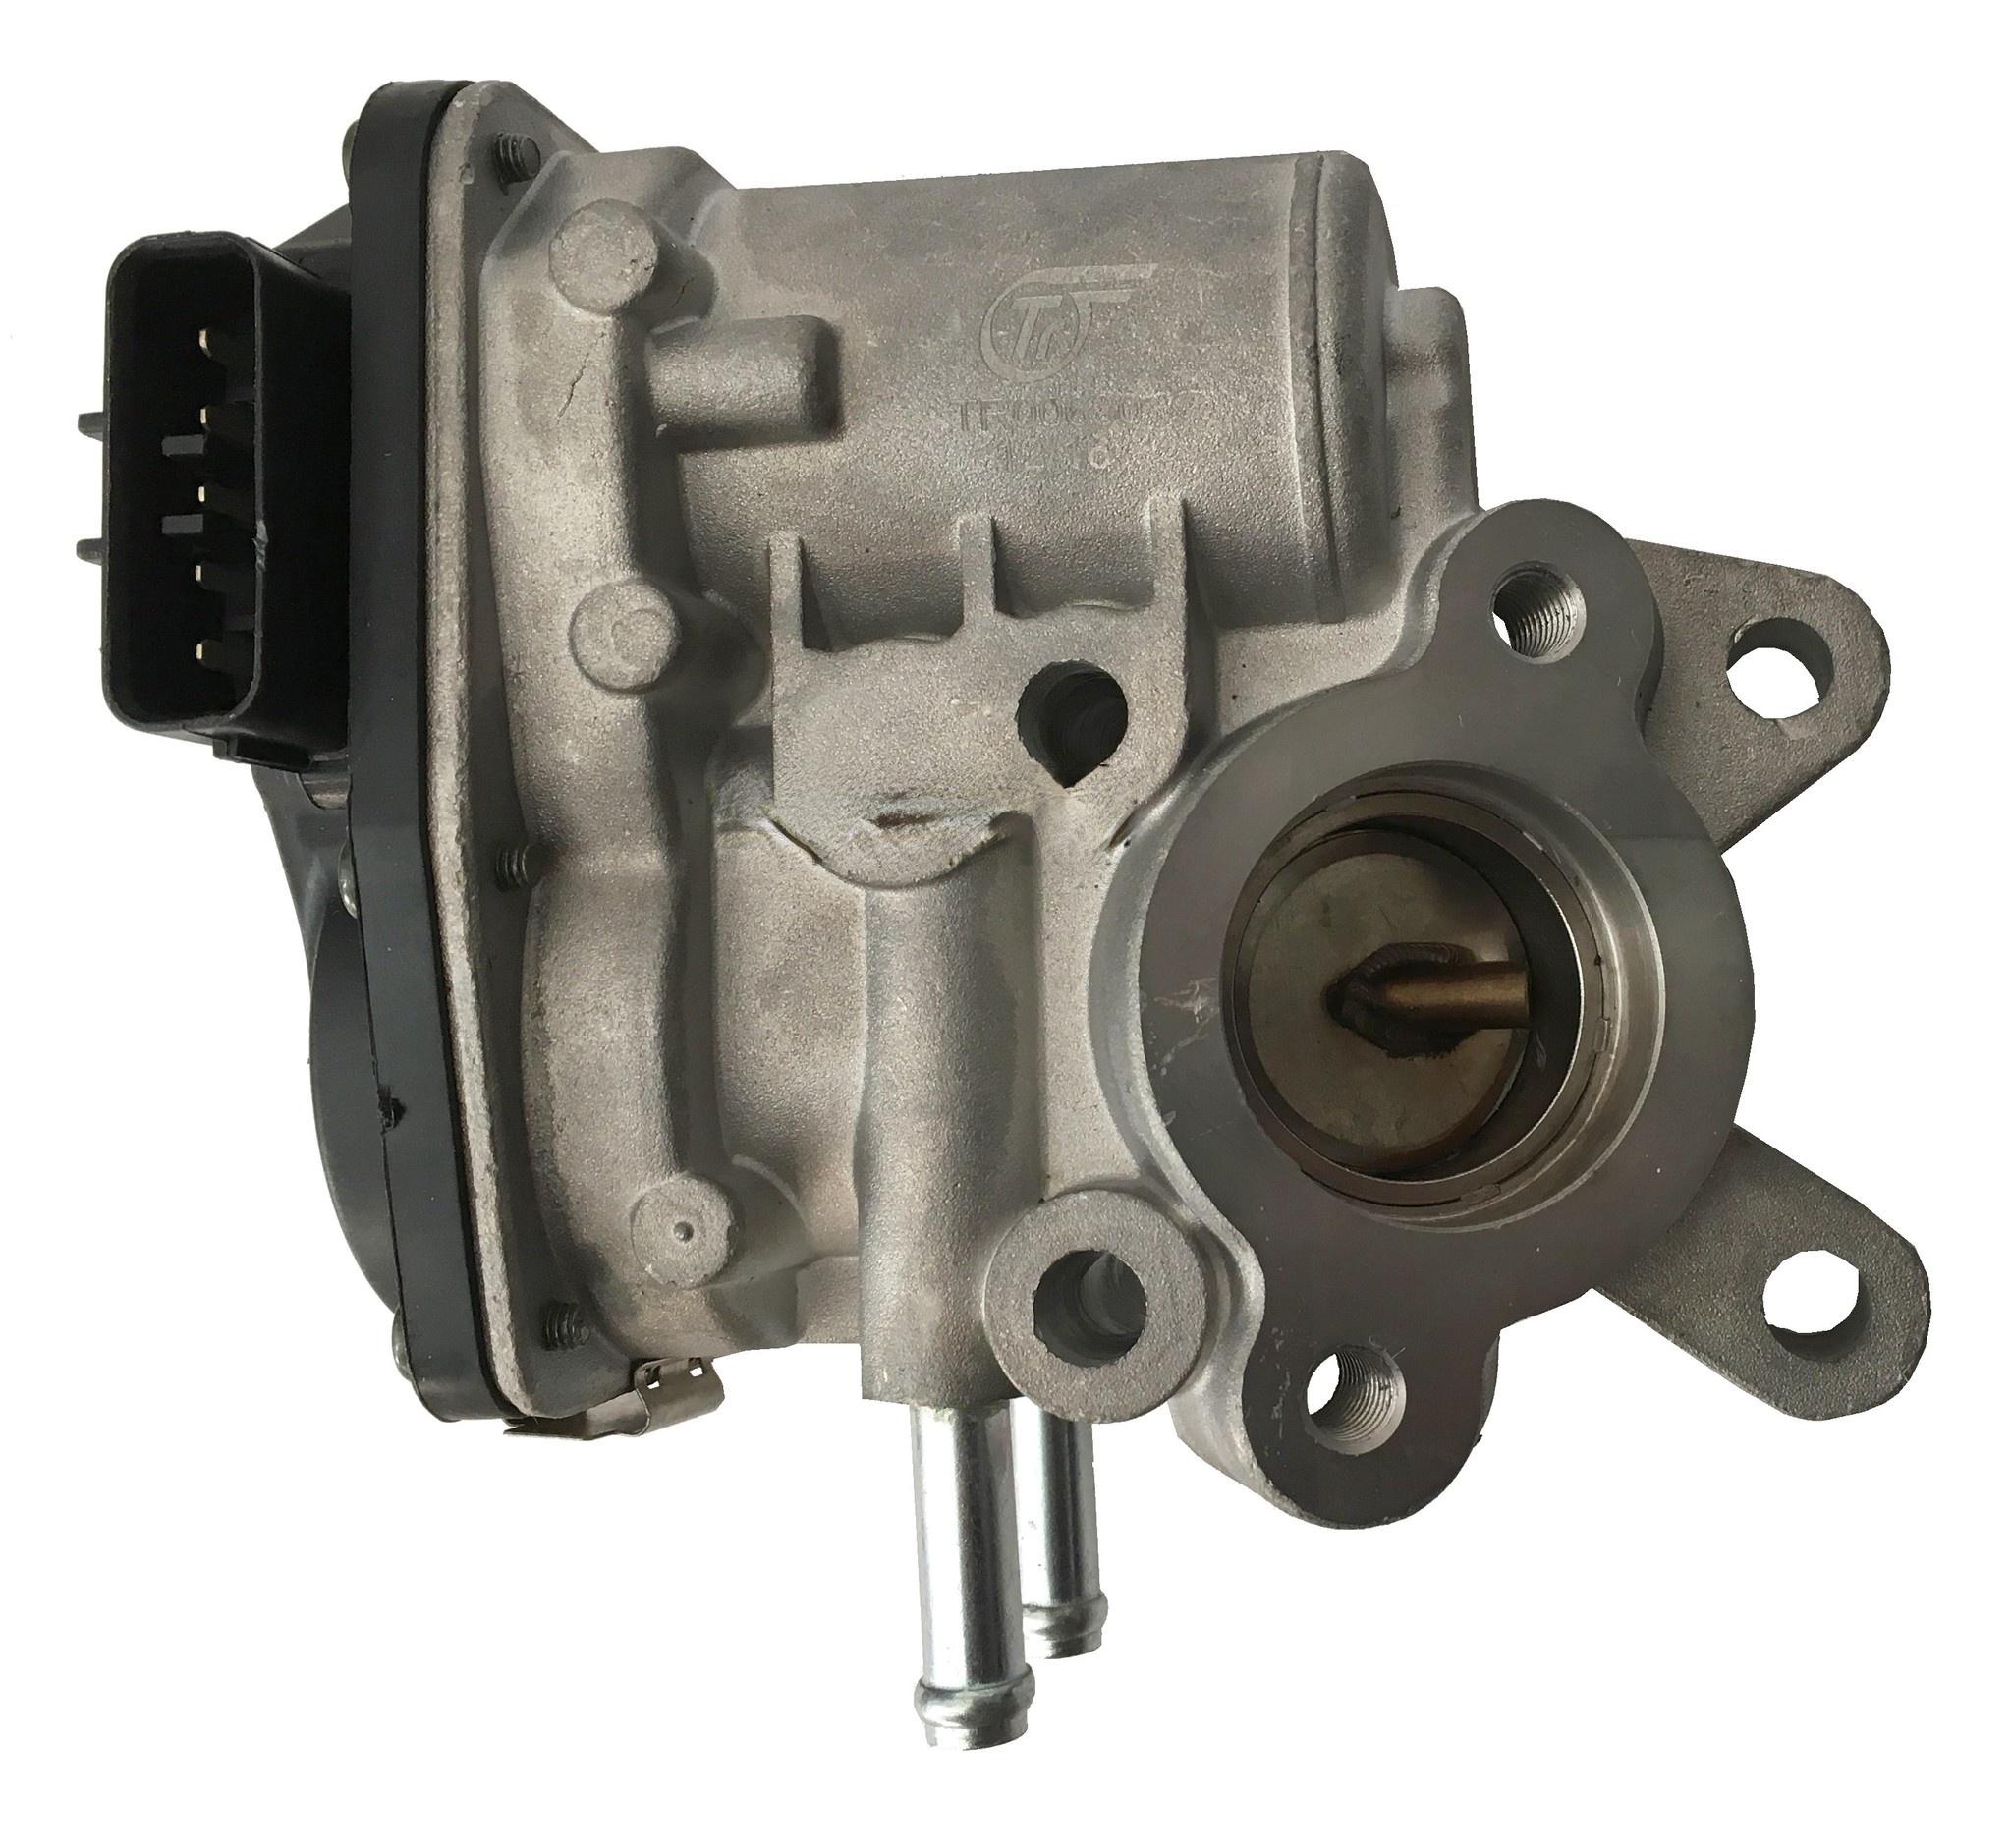 EGR ventil - TR00630 Nissan Navara Pathfinder Náhradní díly prémiové kvality